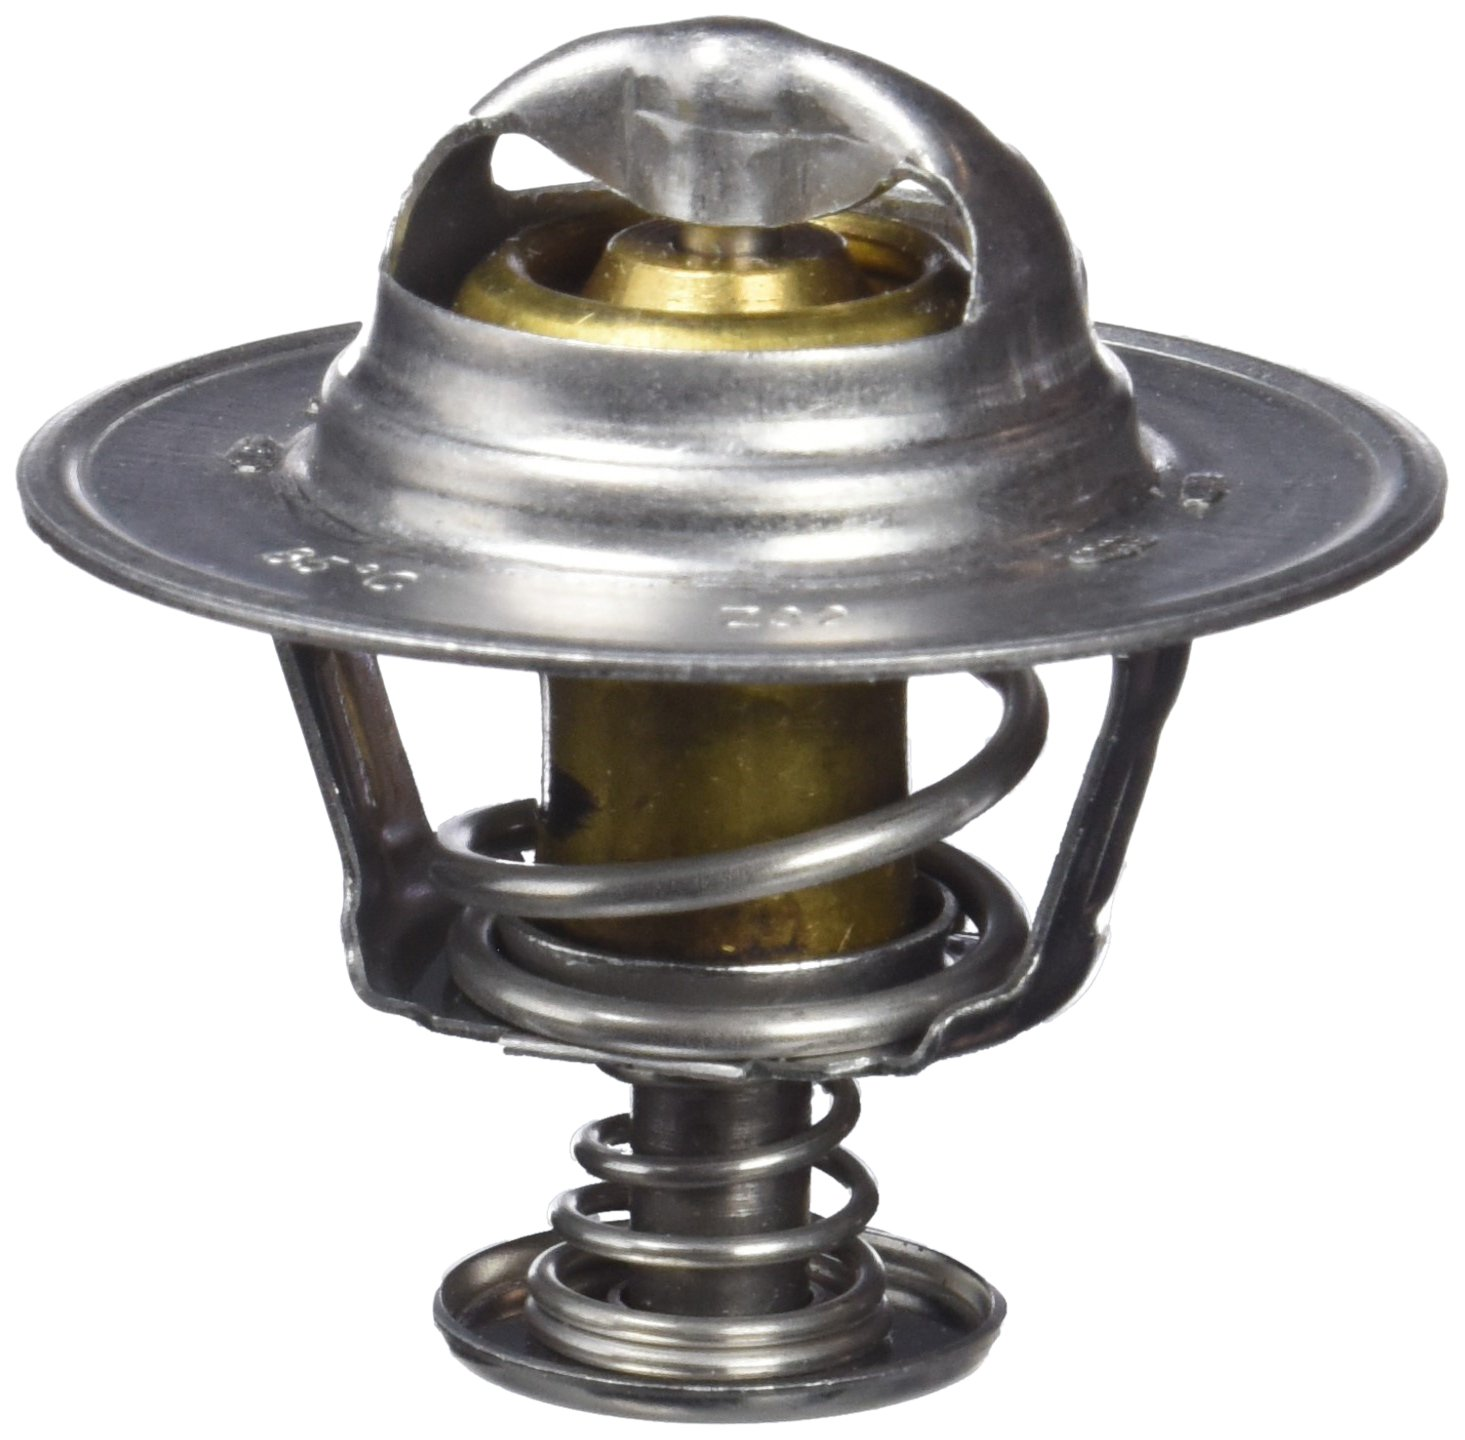 FAE 5307585 Thermostat d'eau Francisco Albero S.A.